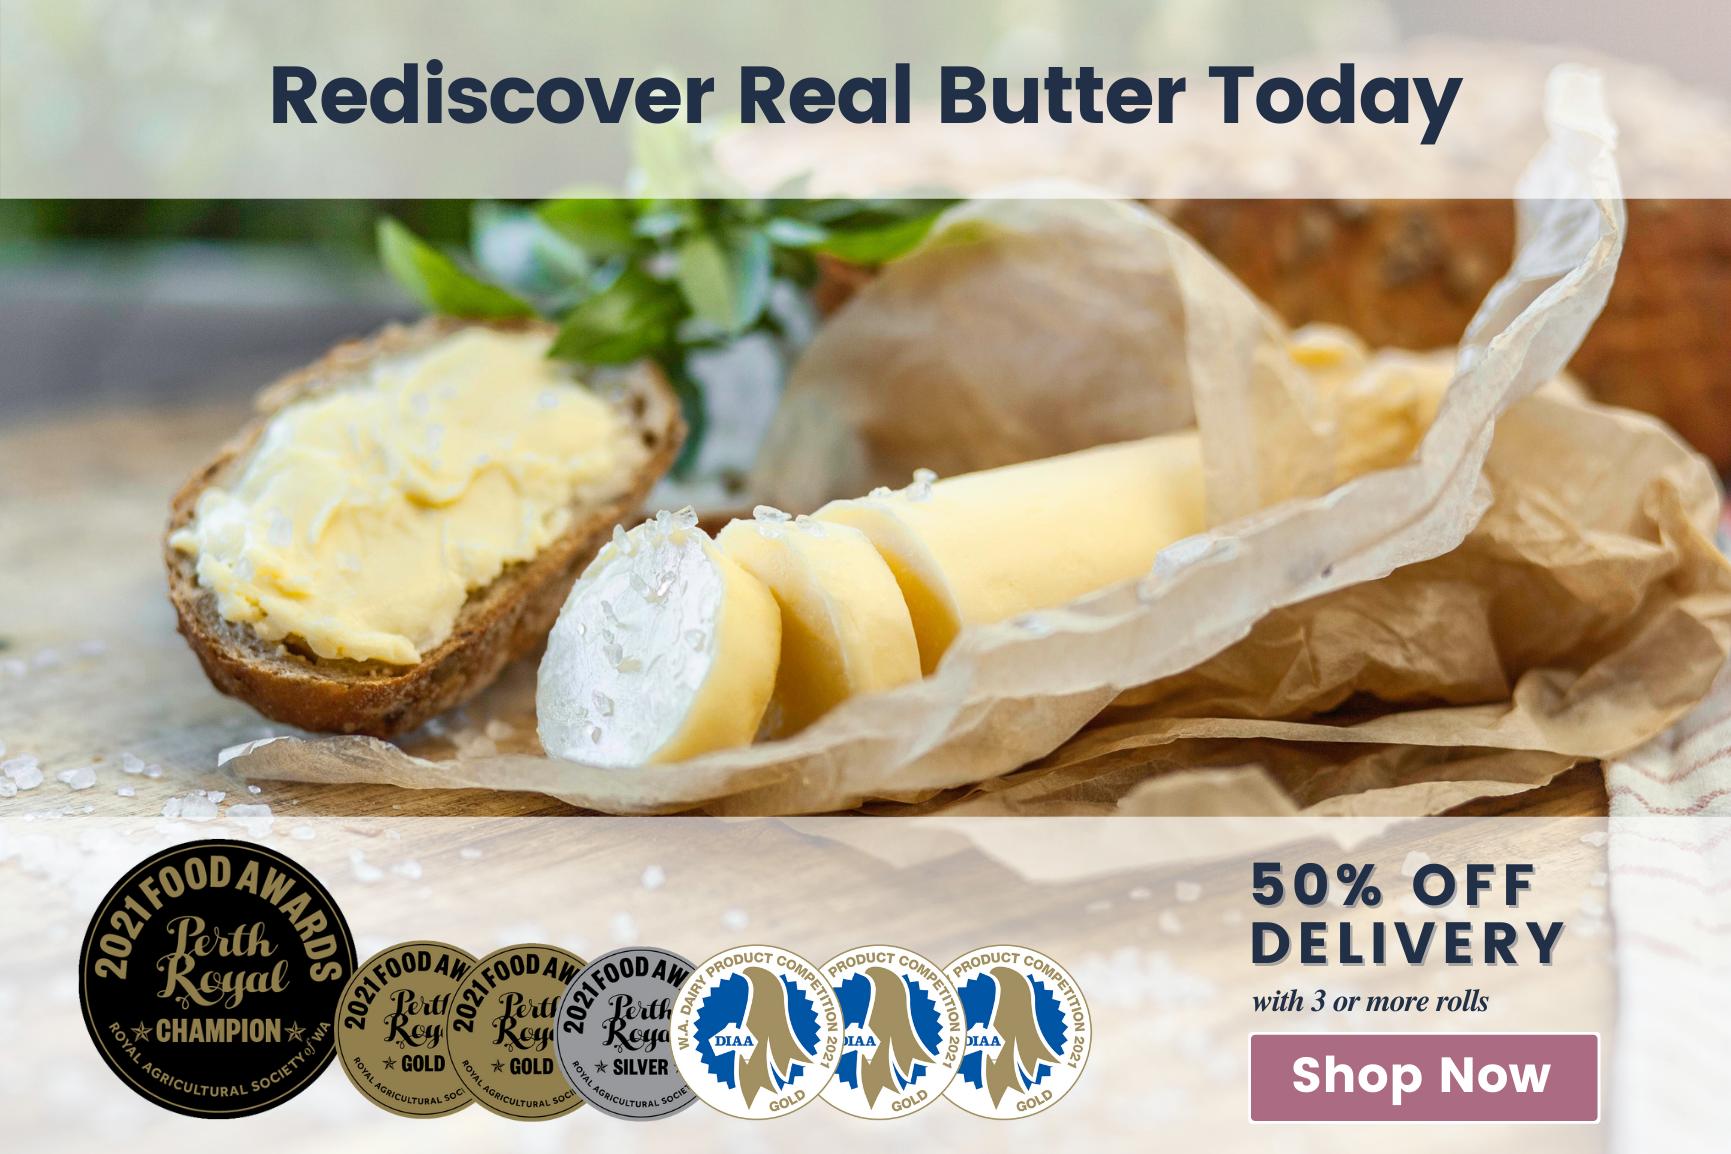 Rediscover Real Butter (Landscape)